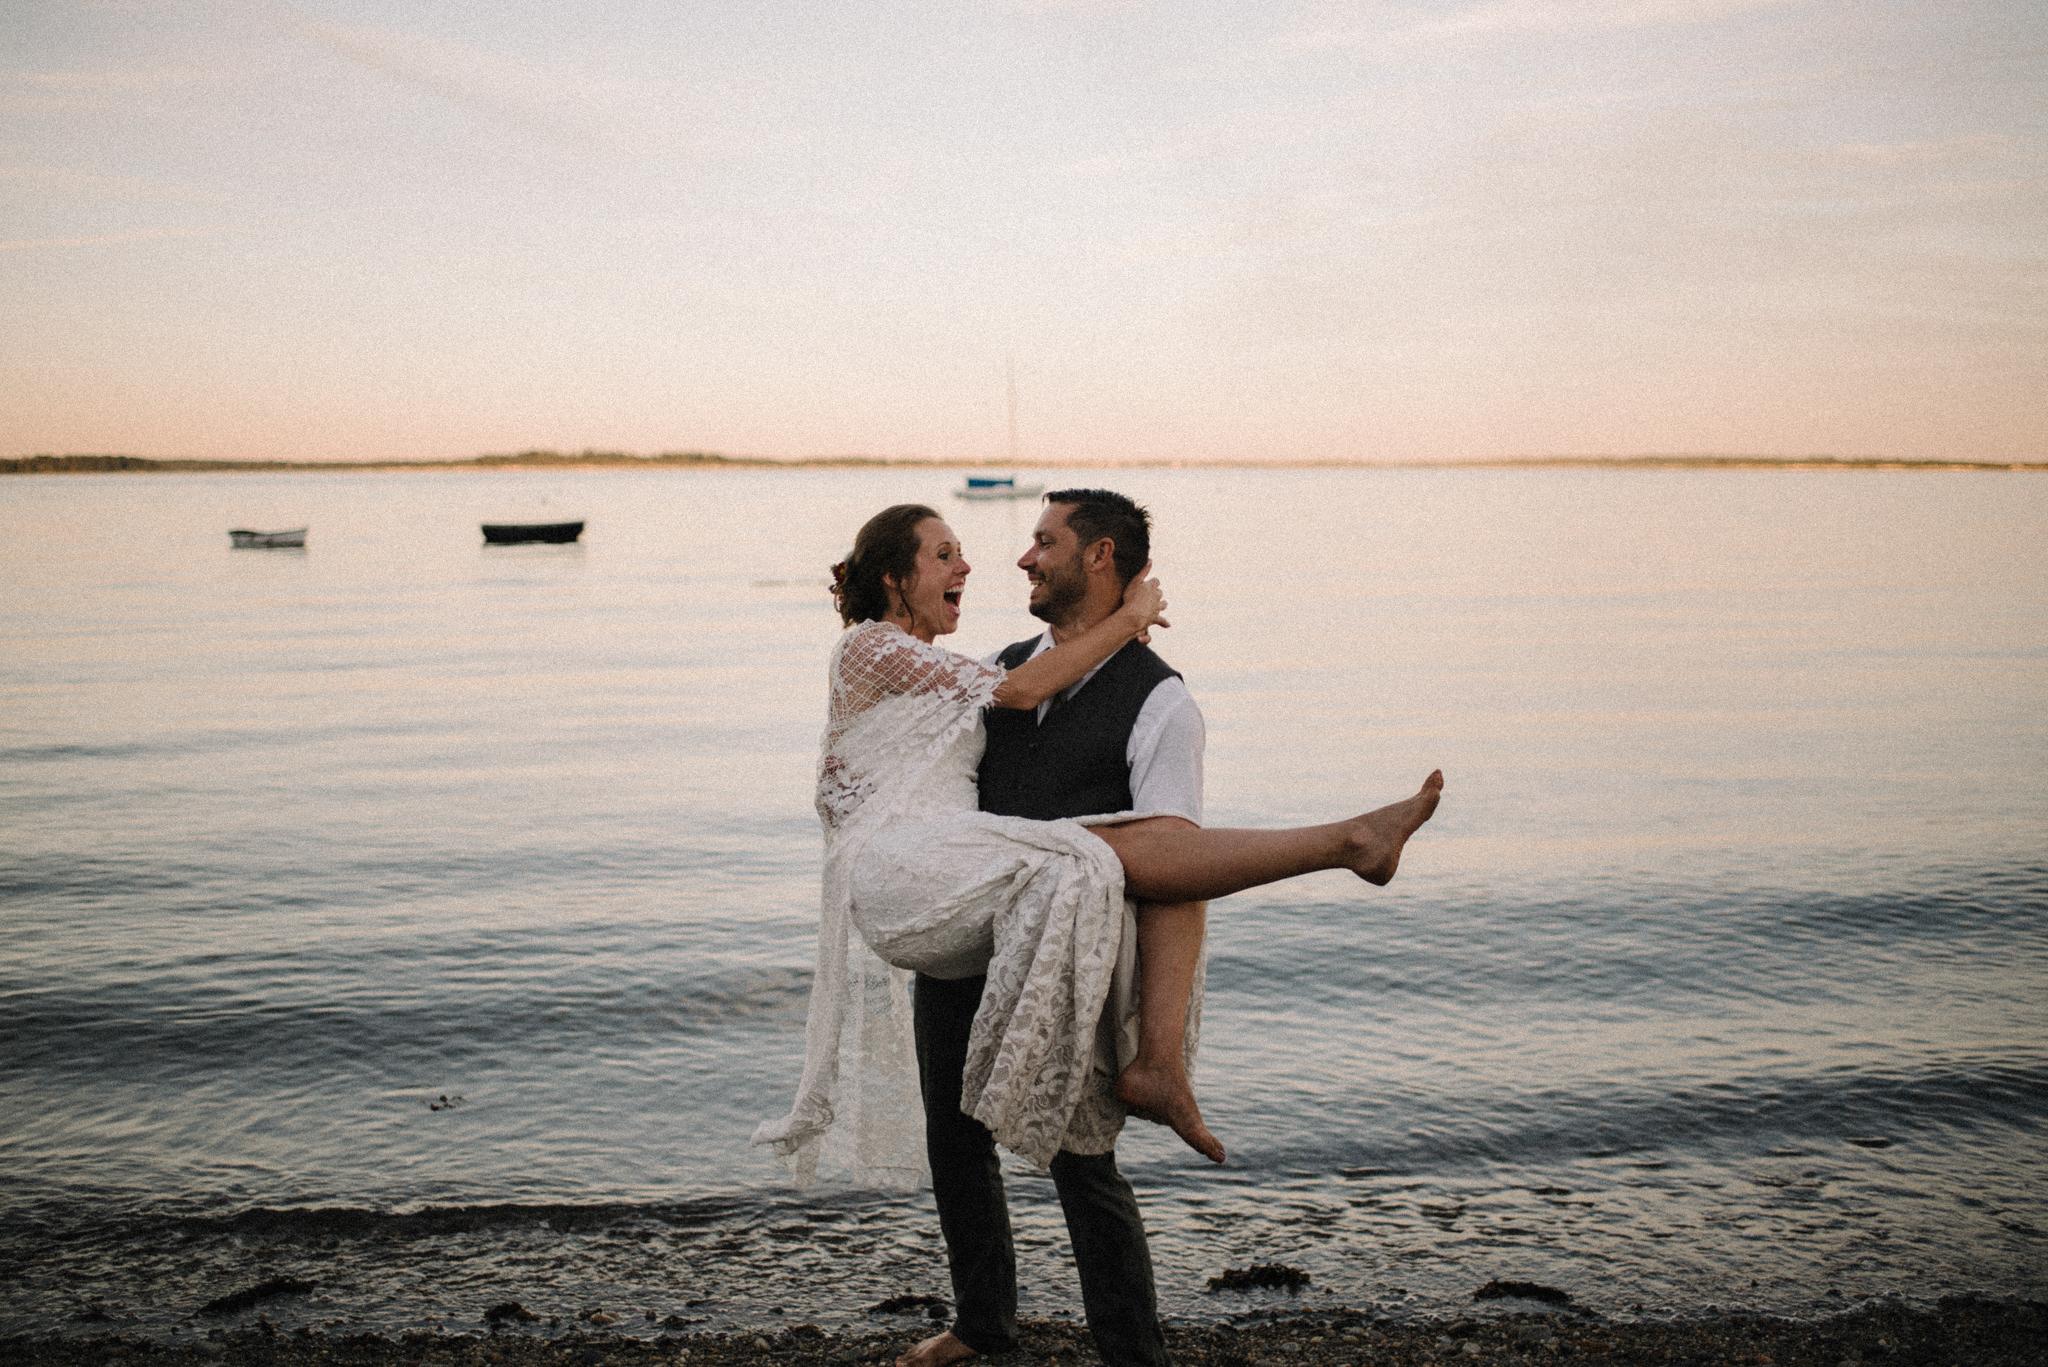 Damian and Jesse Chebeague Island Maine Backyard Destination Beach Wedding White Sails Creative_24.JPG